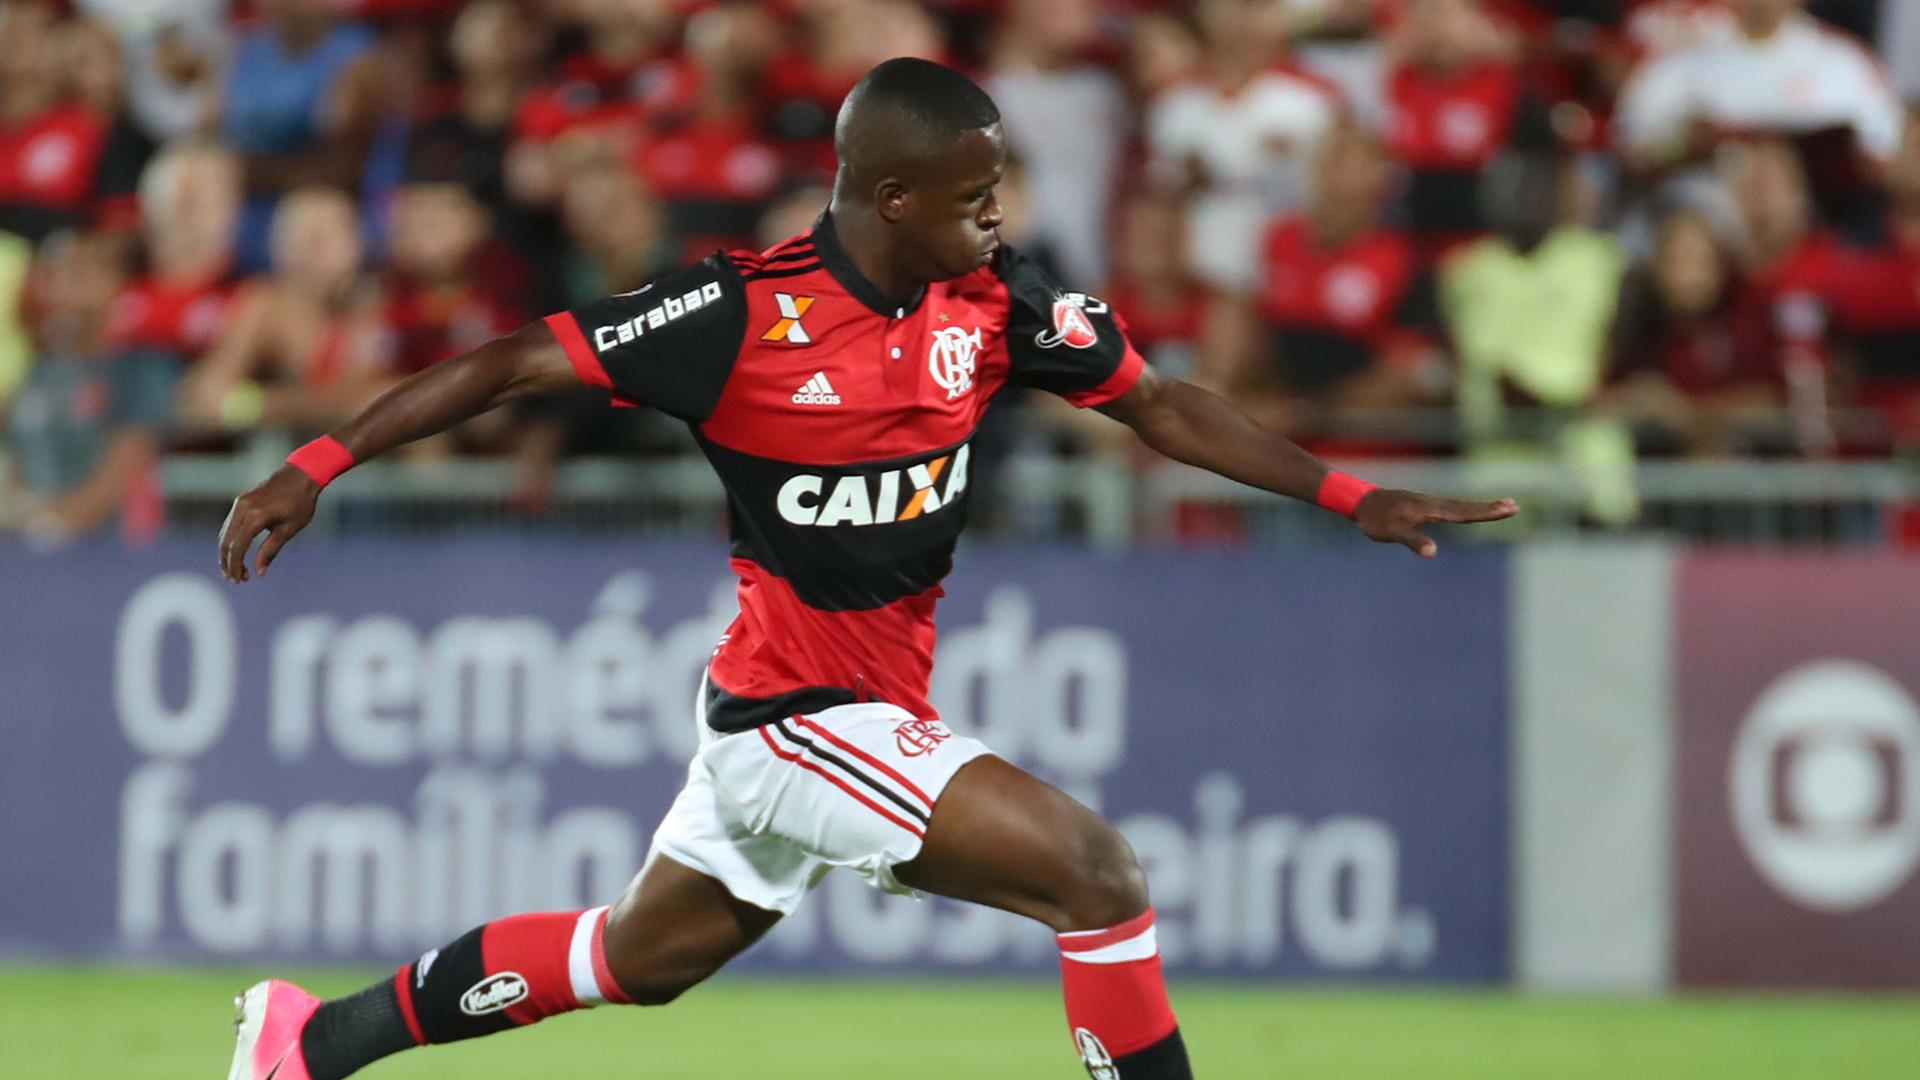 Vasco vende 'joia' por R$ 55,7 milhões